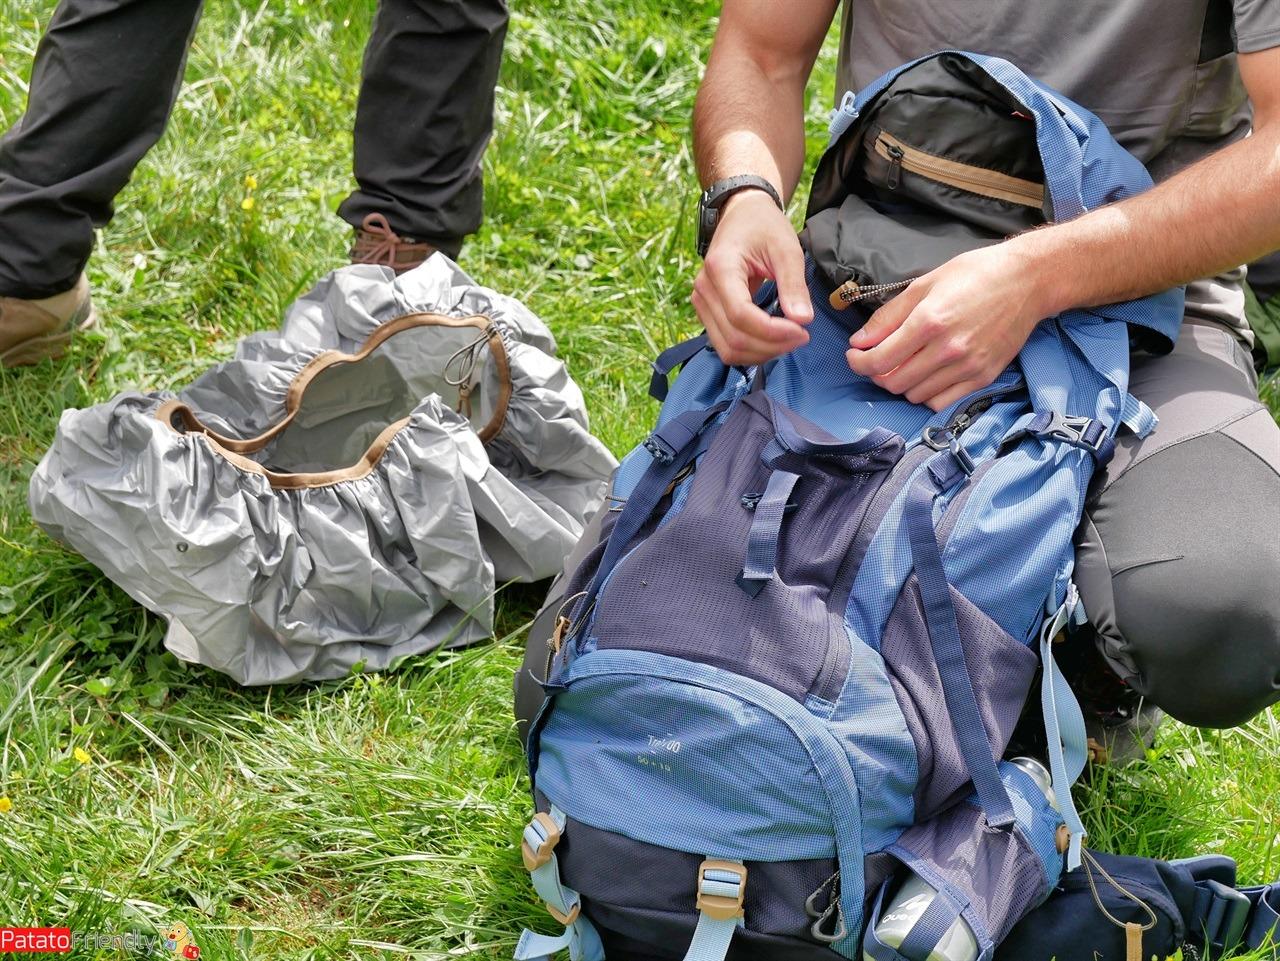 [cml_media_alt id='14440']Zaino Decathlon per viaggi e trekking[/cml_media_alt]